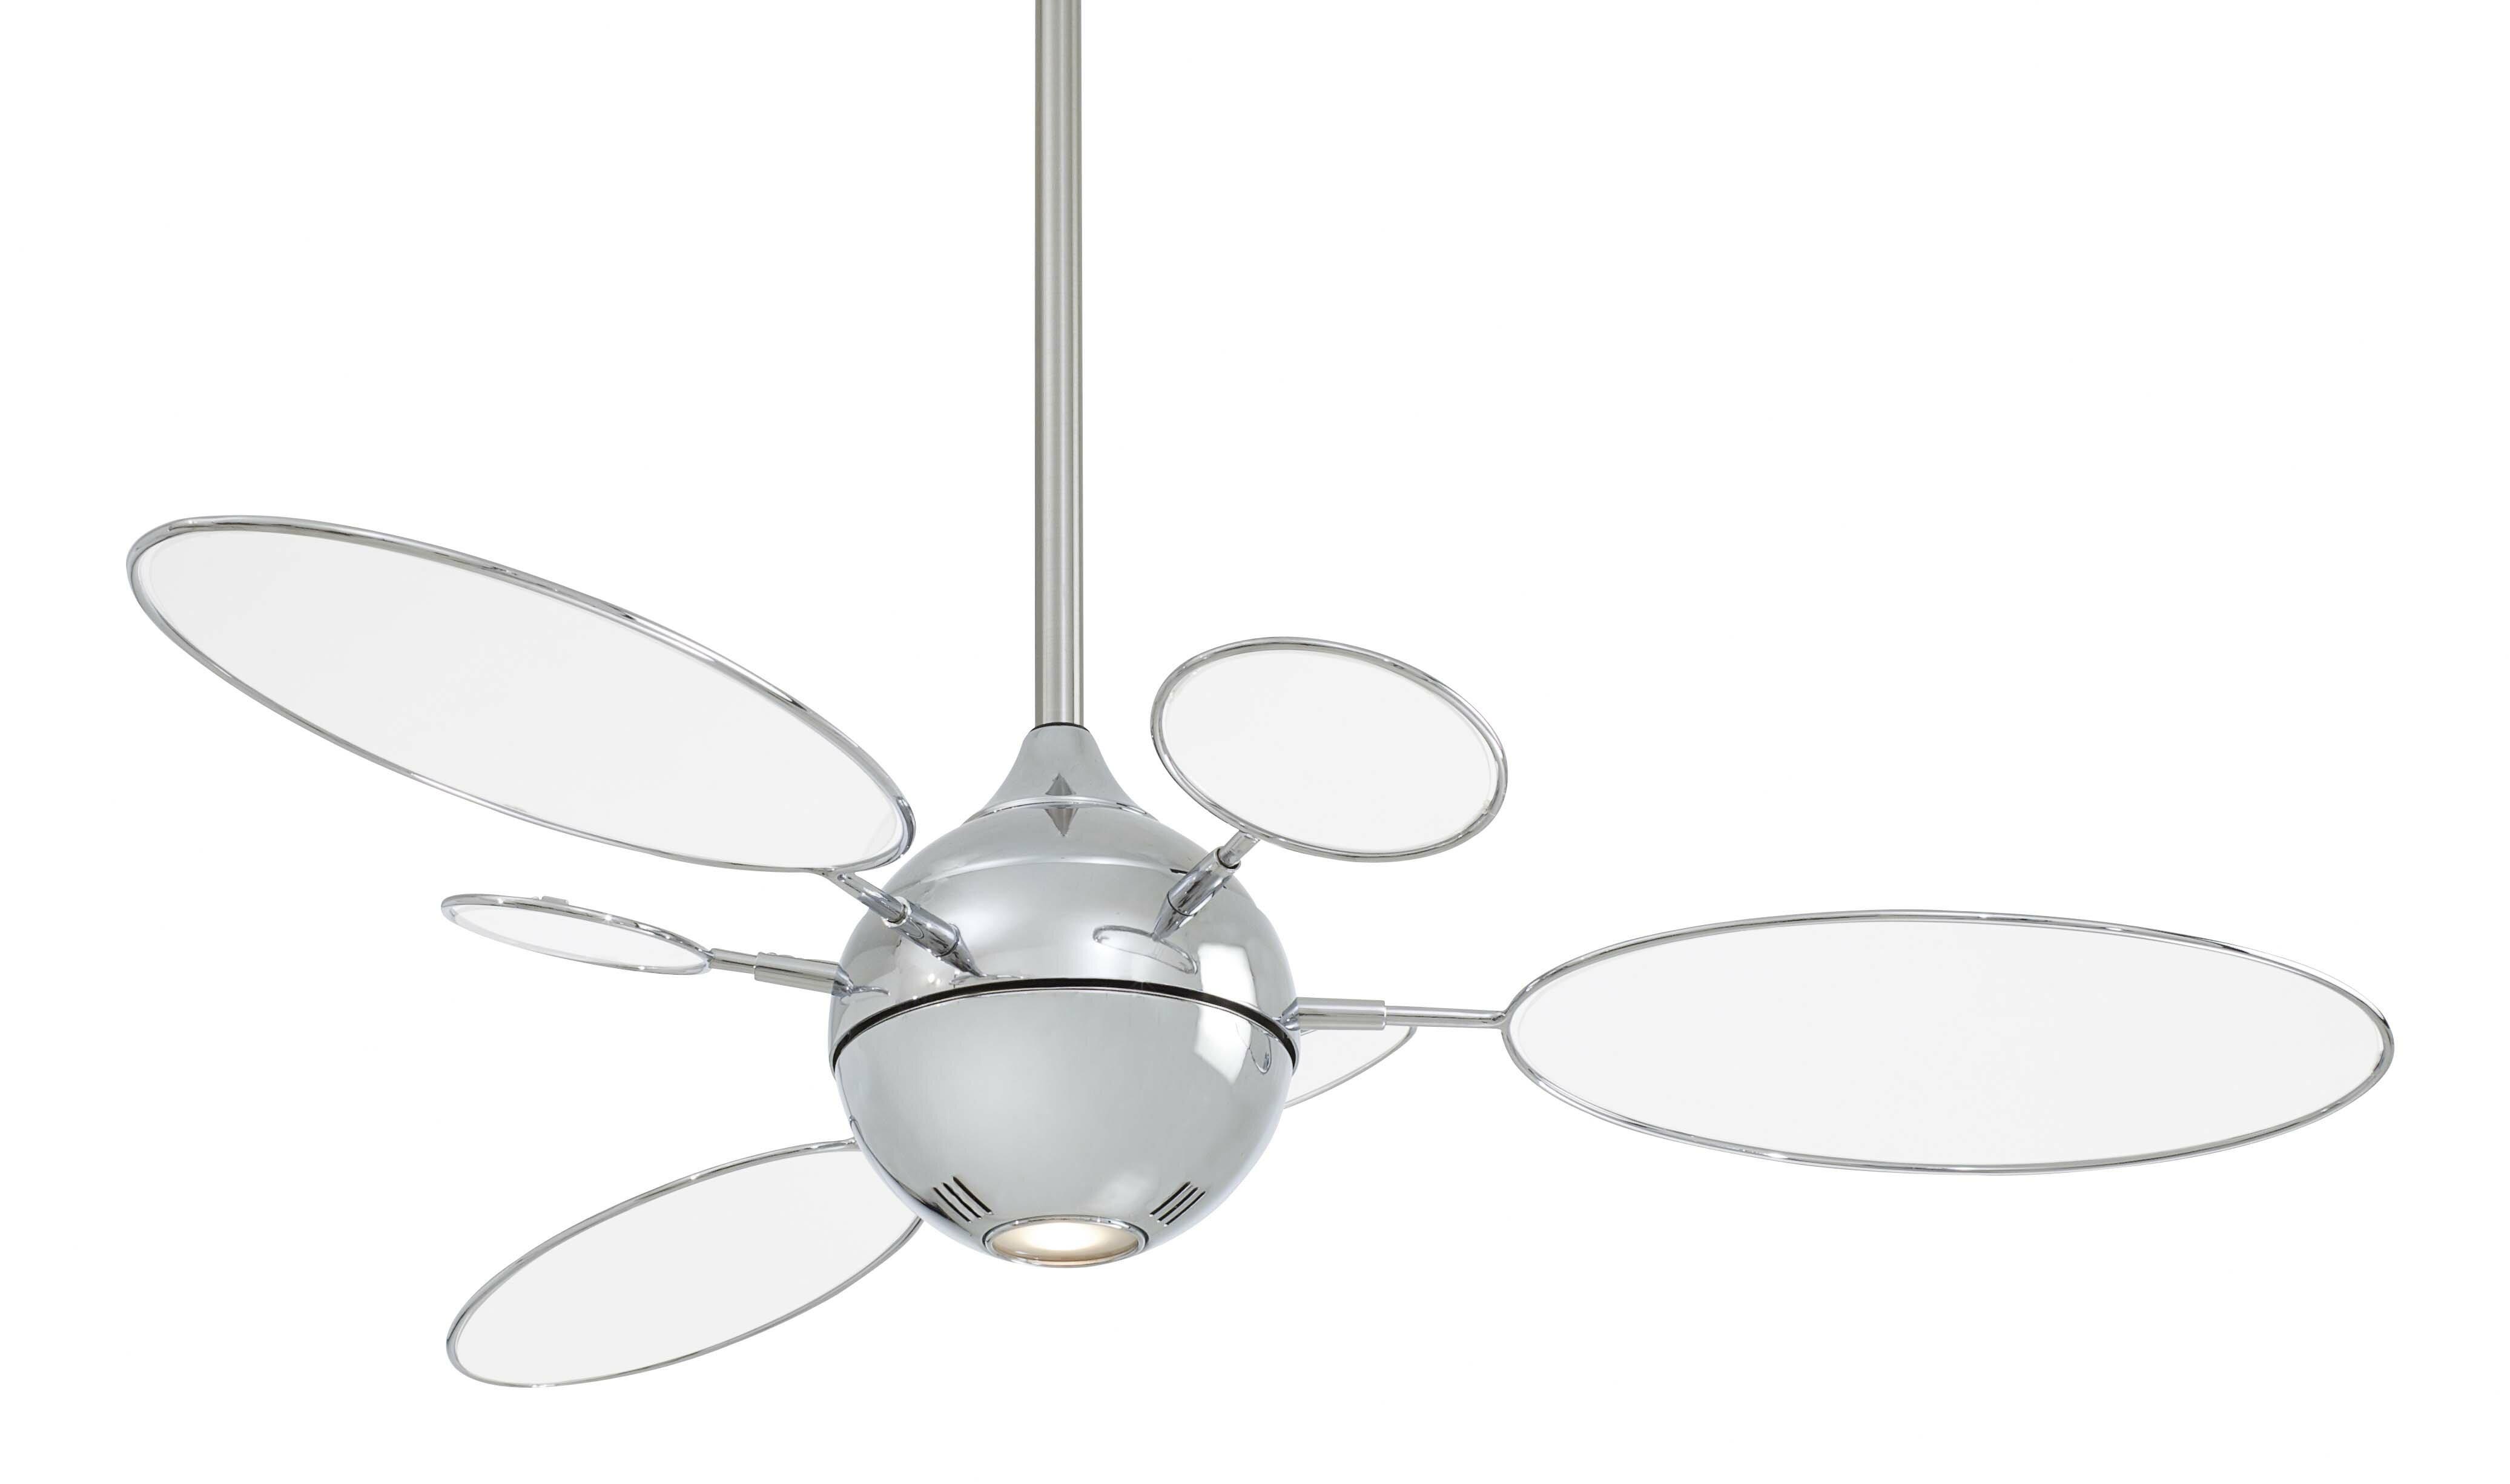 Minka Aire 54 George Kovacs 6 Blade Ceiling Fan Light Kit Included